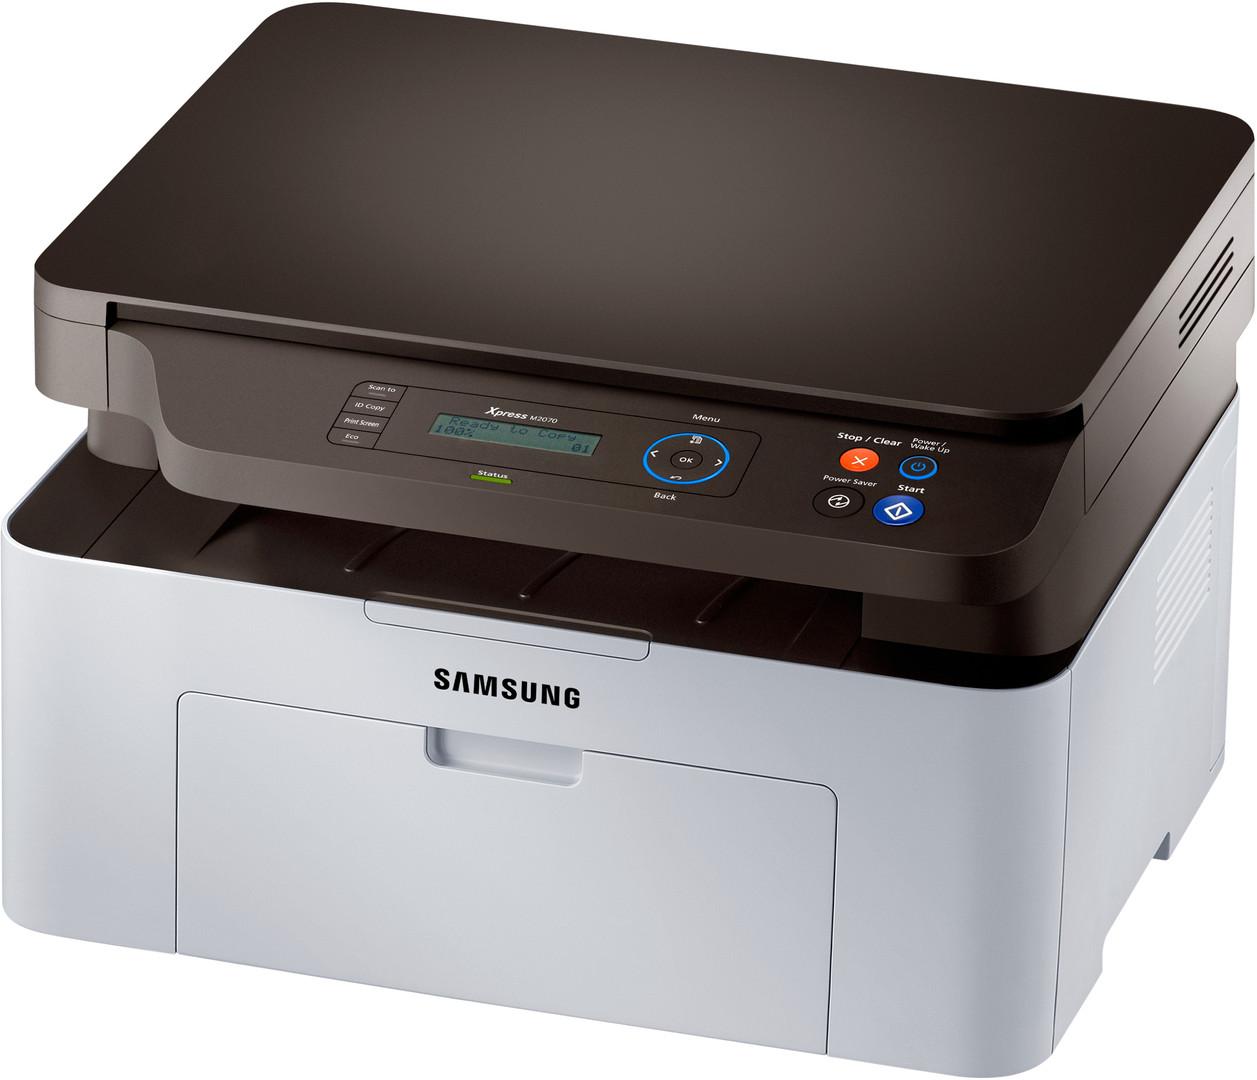 Stampante Laser Multifunzionale Samsung 3 in 1 (M2070)